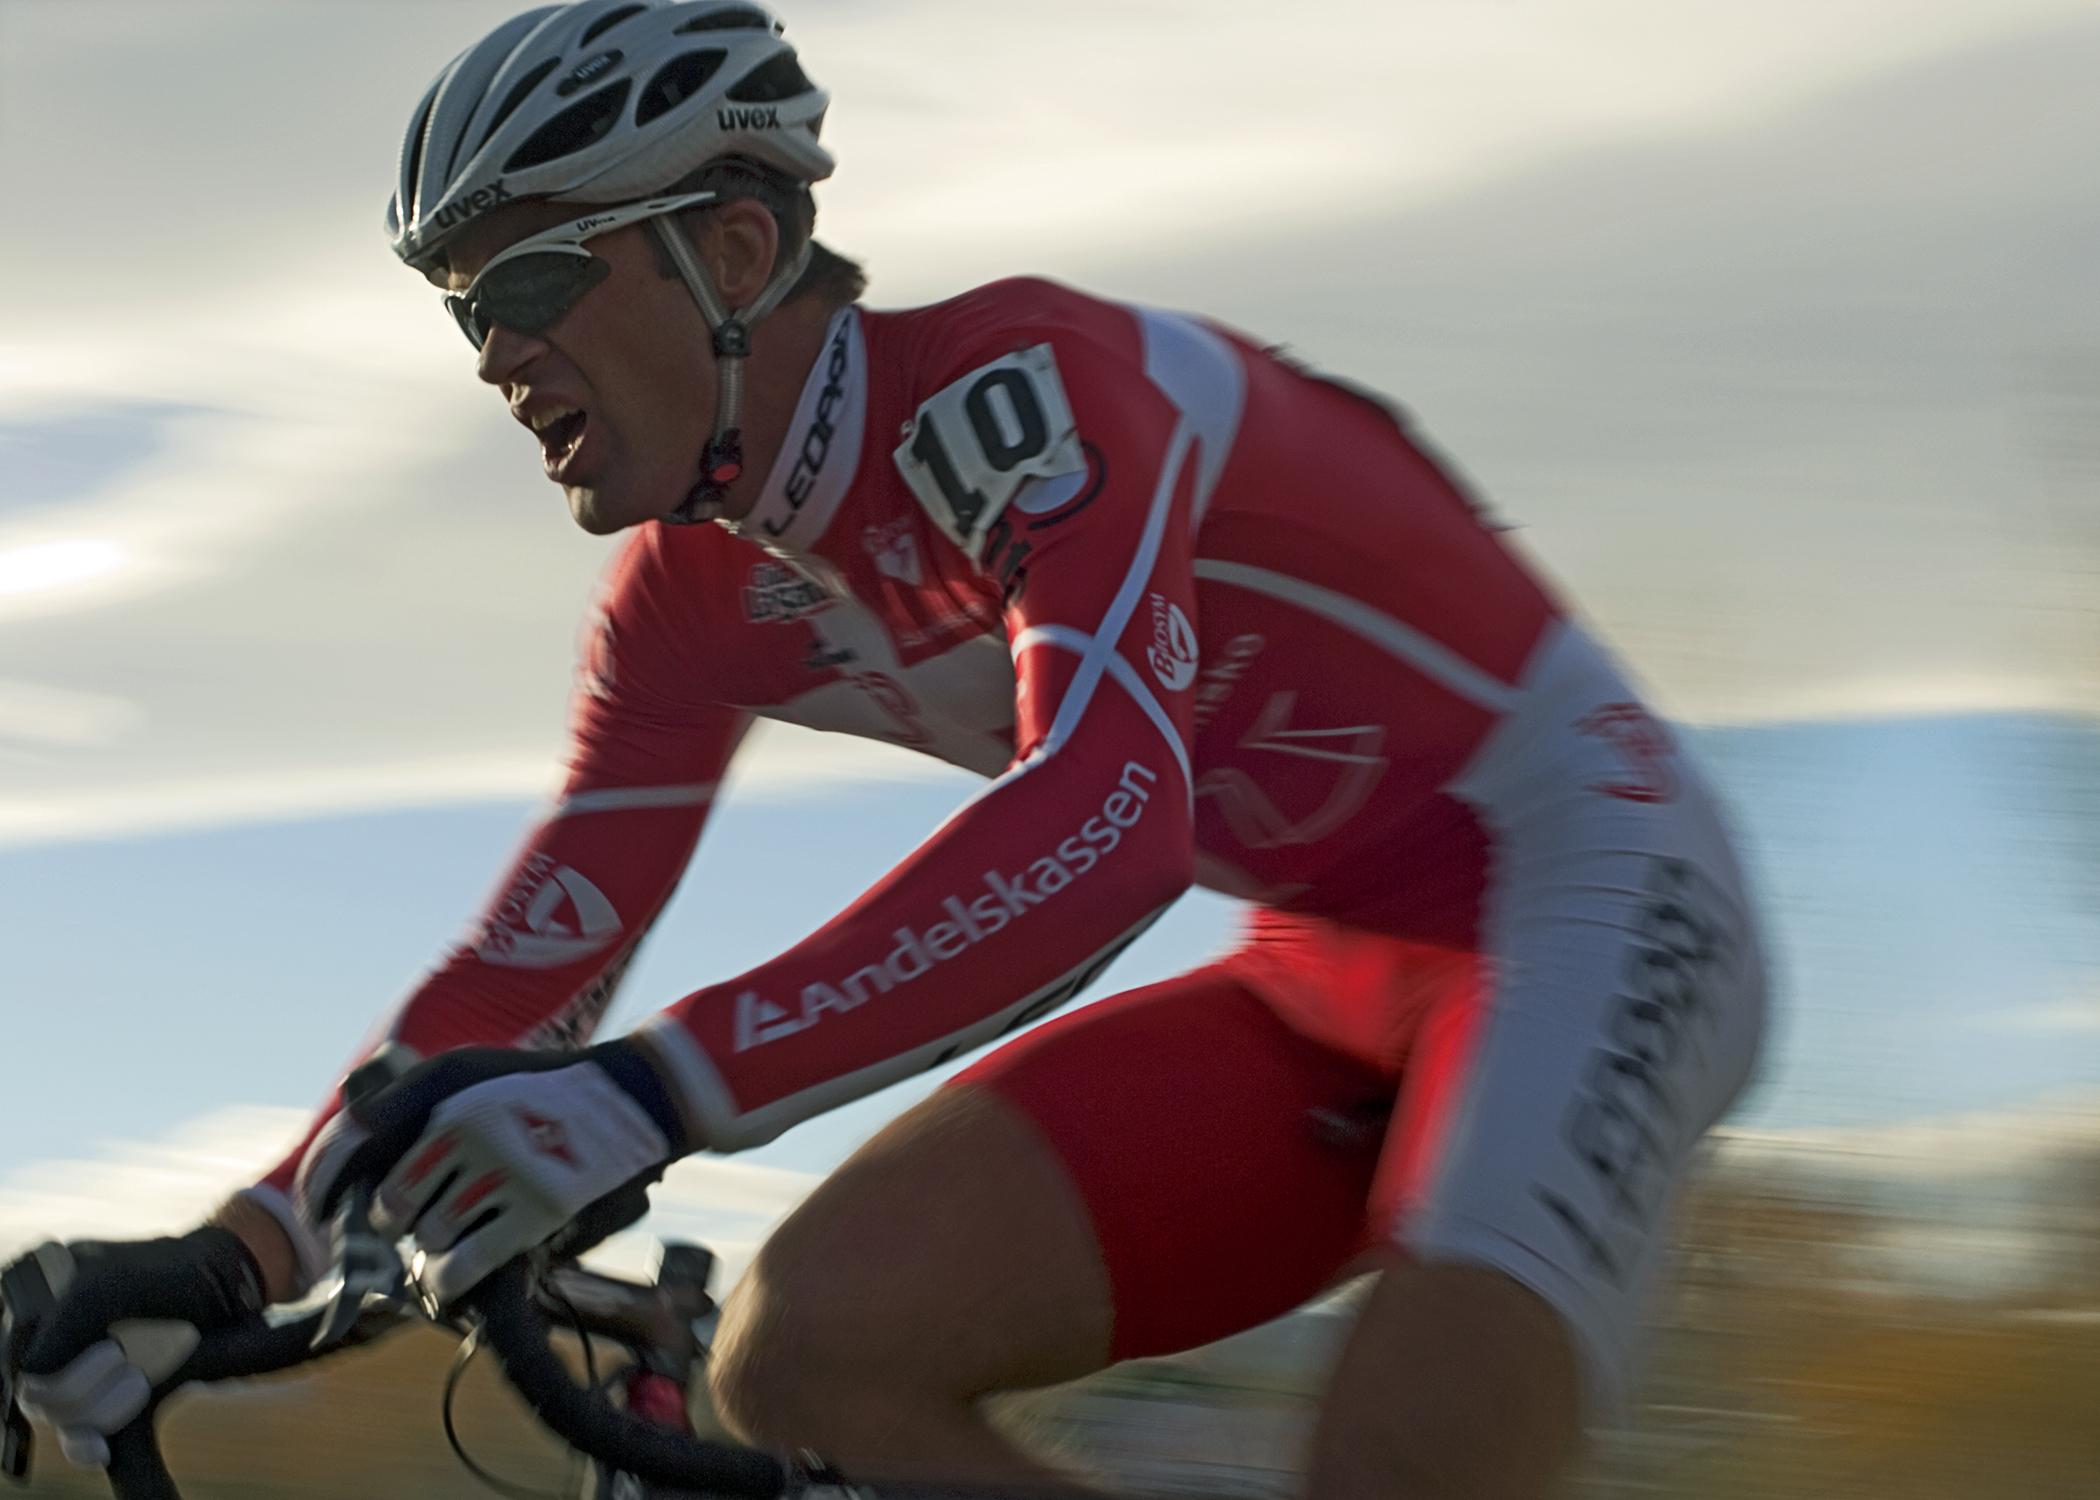 Danish National Cyclocross Champion Joachim Parbo at speed.